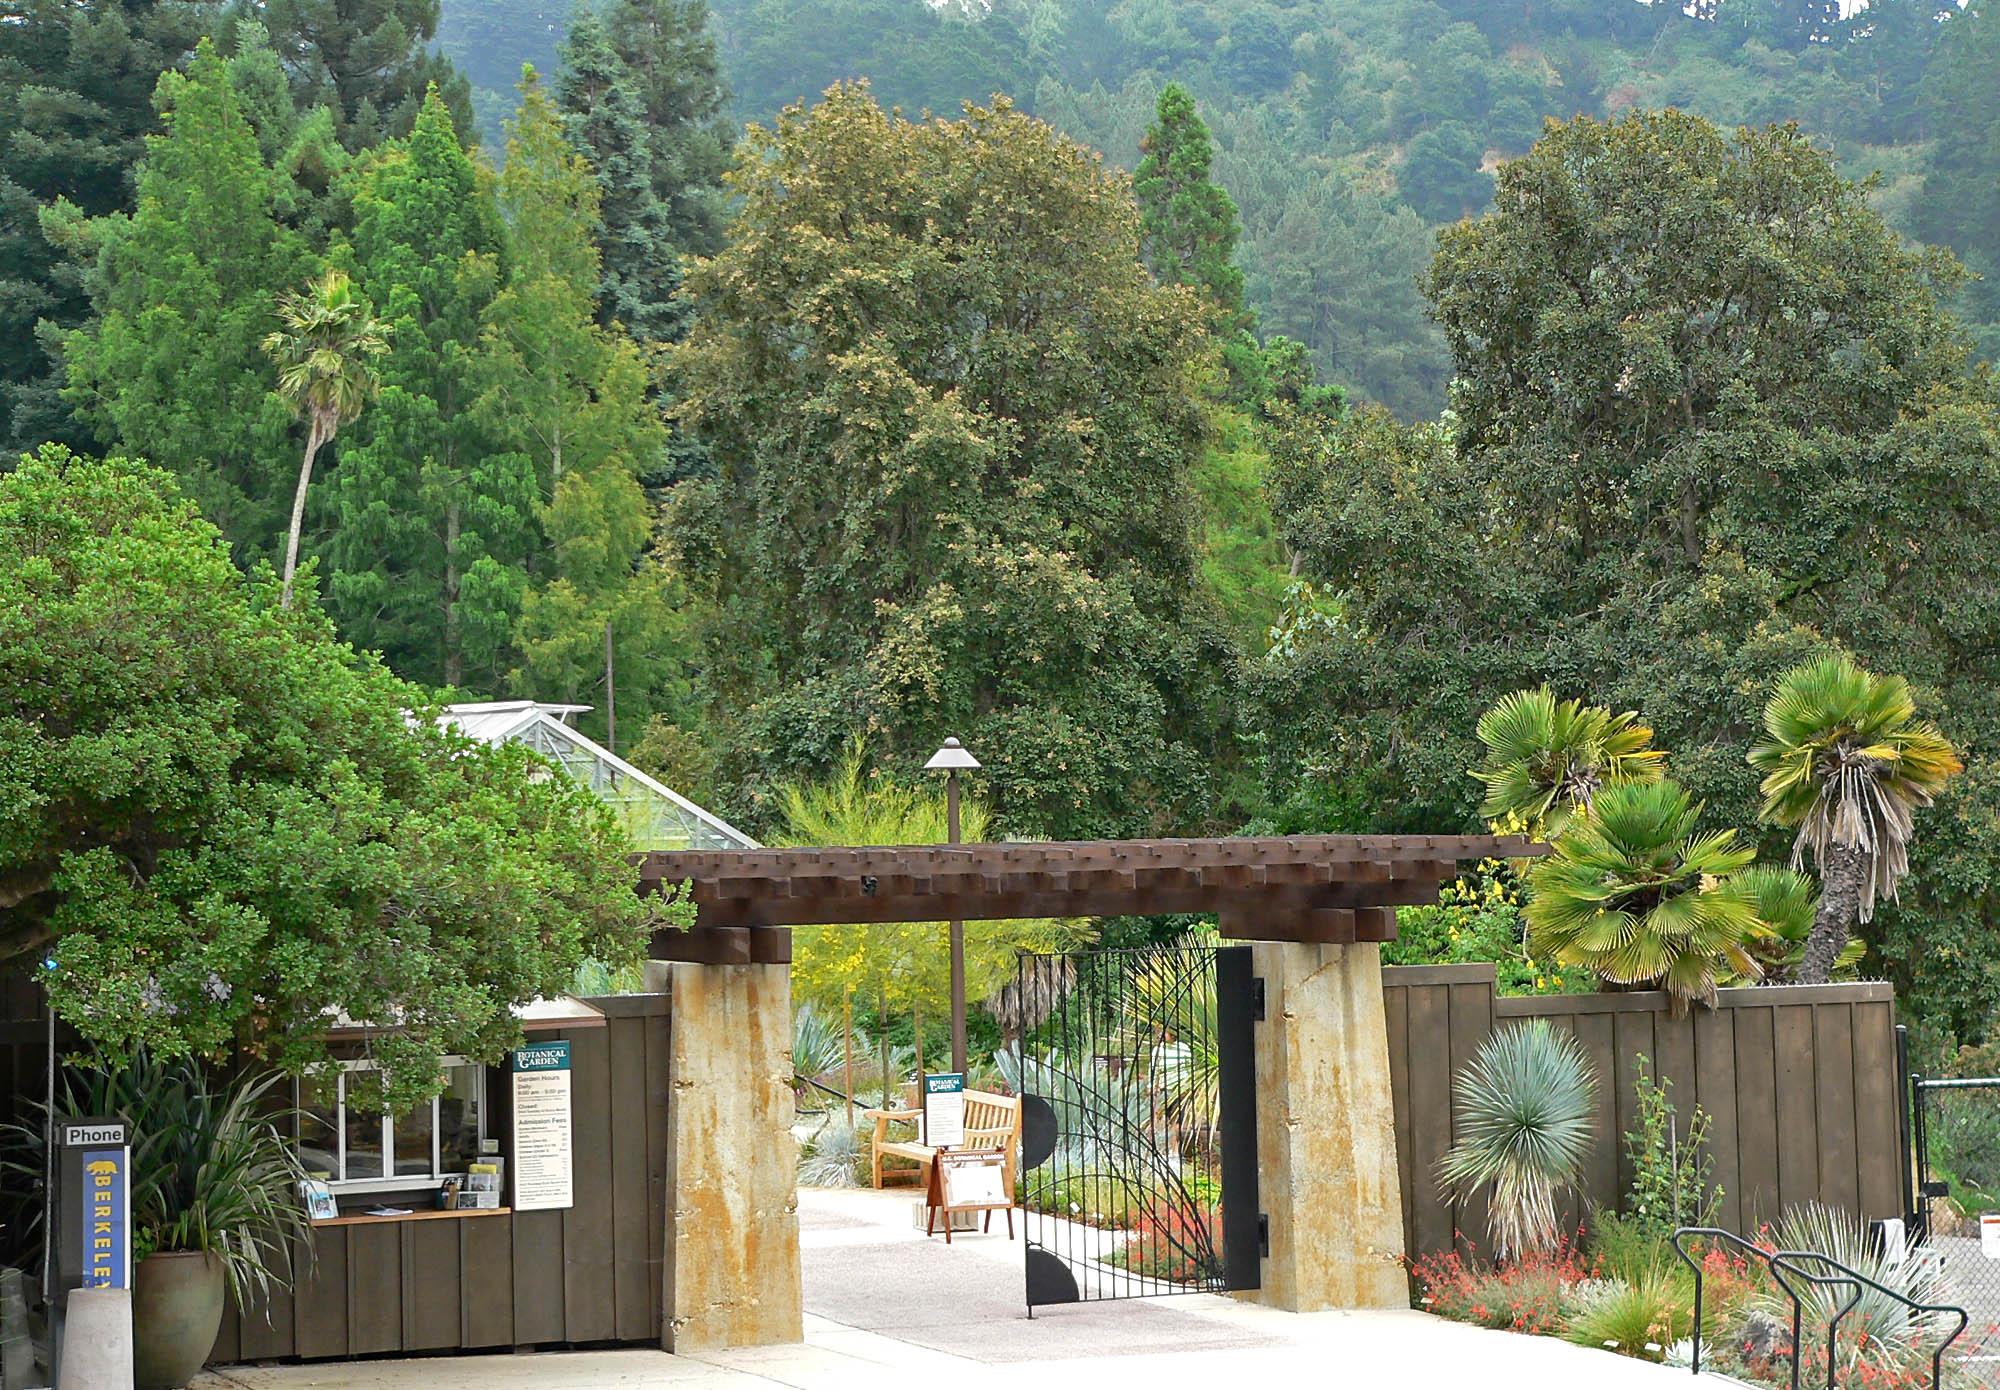 Etonnant UCBG: The University Of California Botanical Garden Is A 34 Acre (13.7 Ha) Botanical  Garden Located On The University Of California, Berkeley Campuu2026